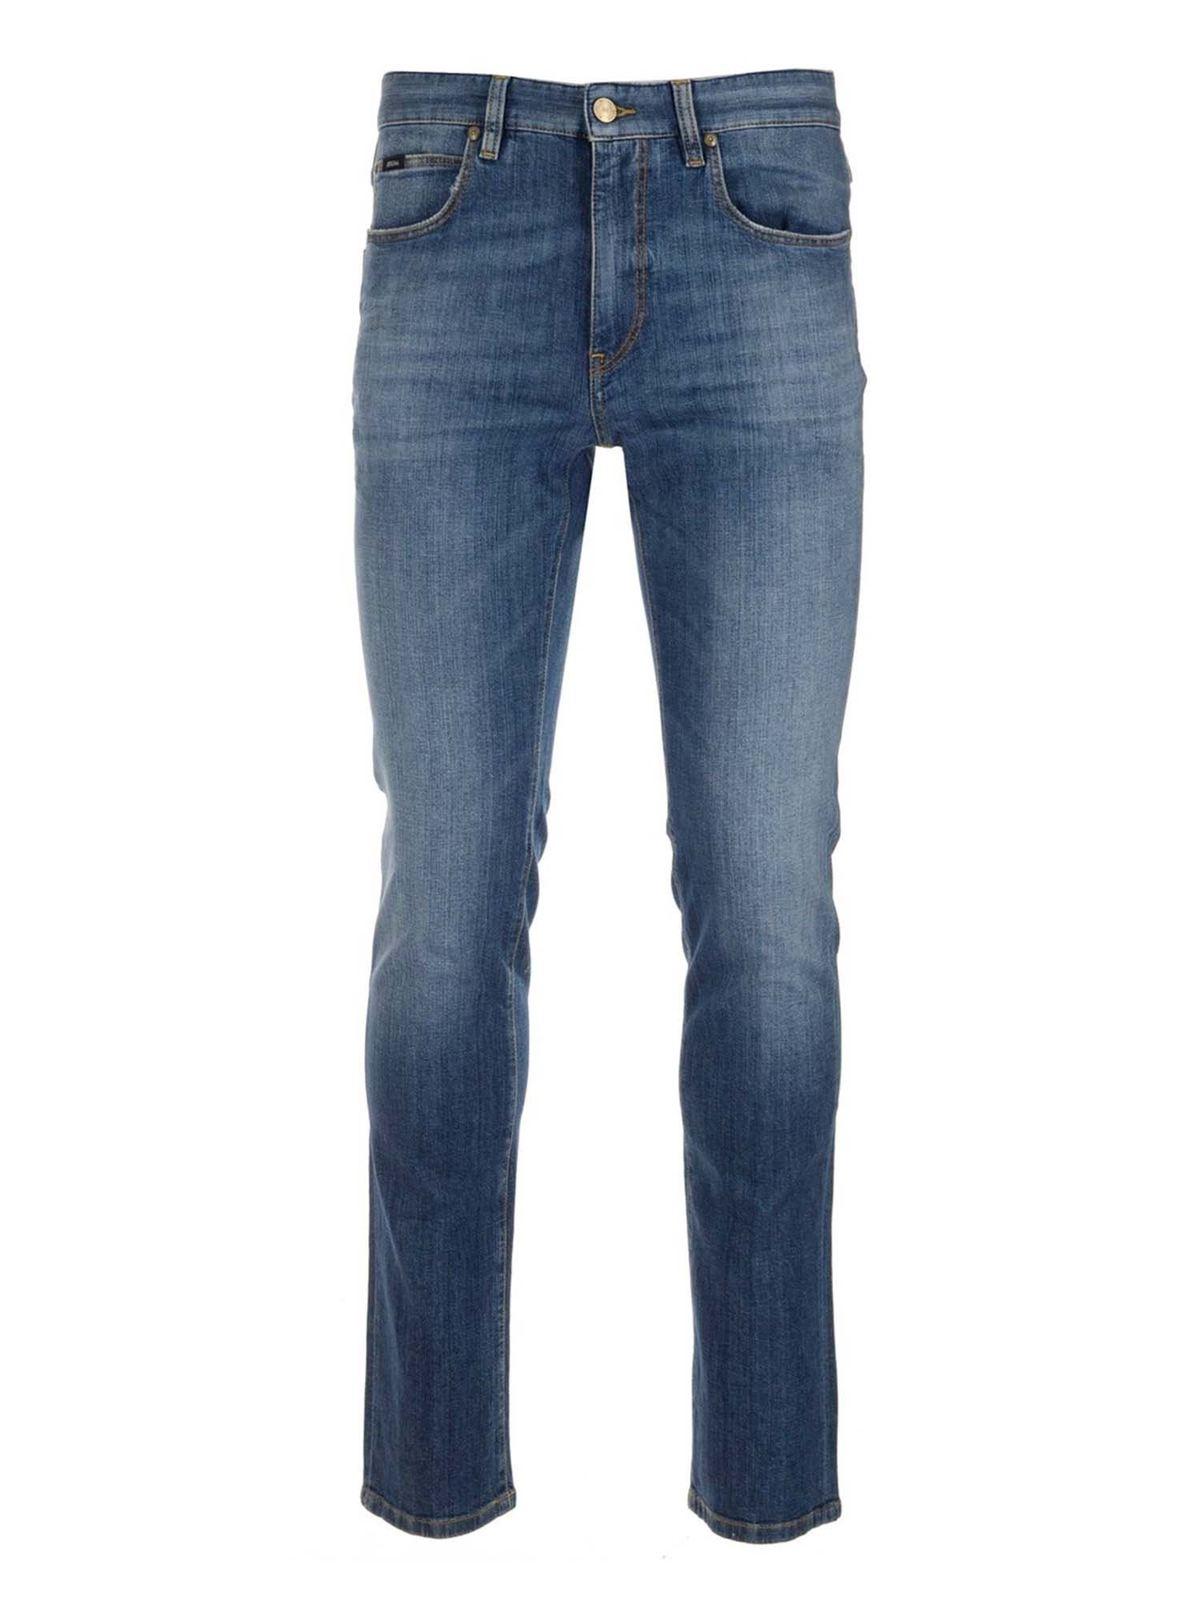 Z Zegna Faded Slim Fit Jean In Blue